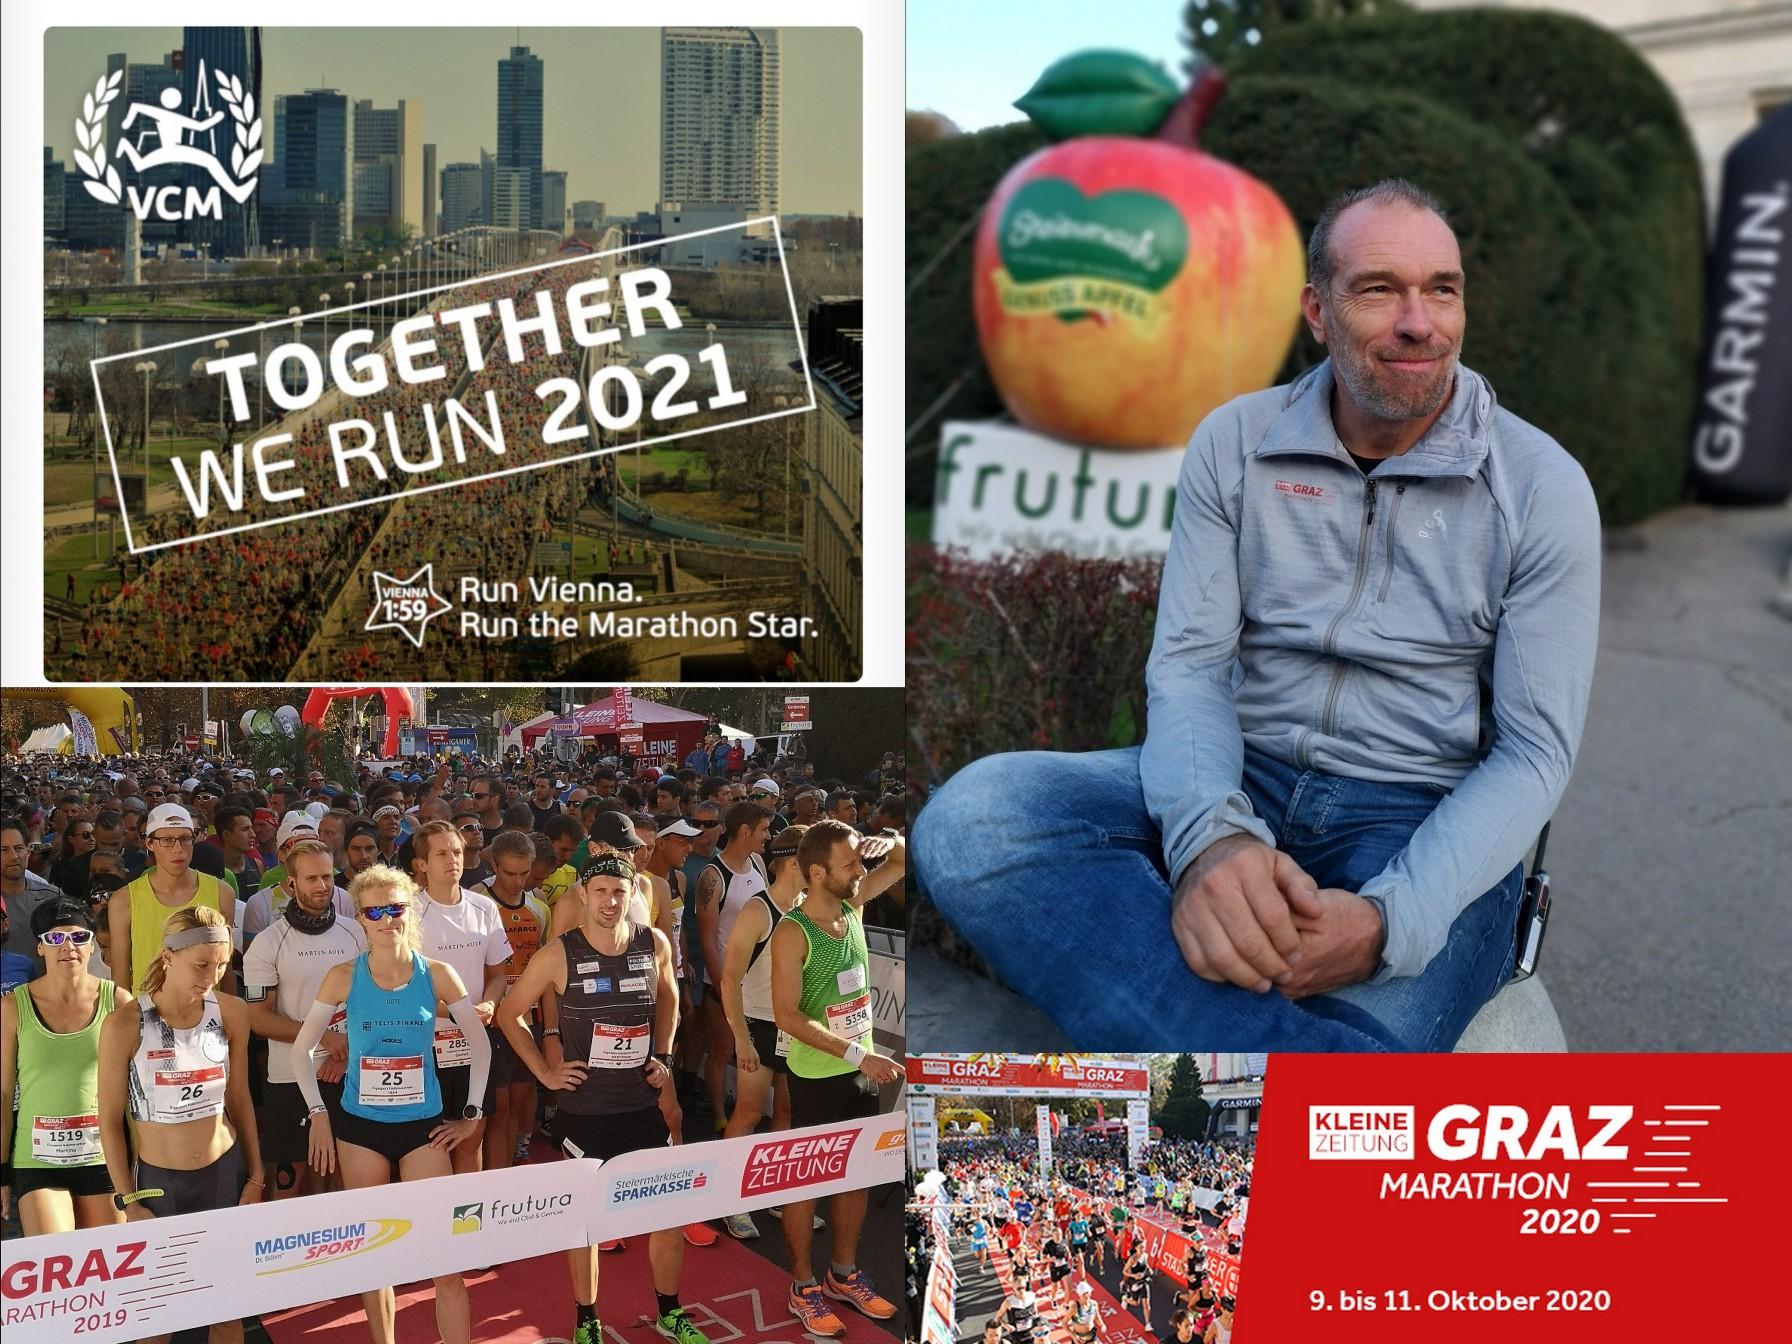 VCM wettert gegen Graz Marathon